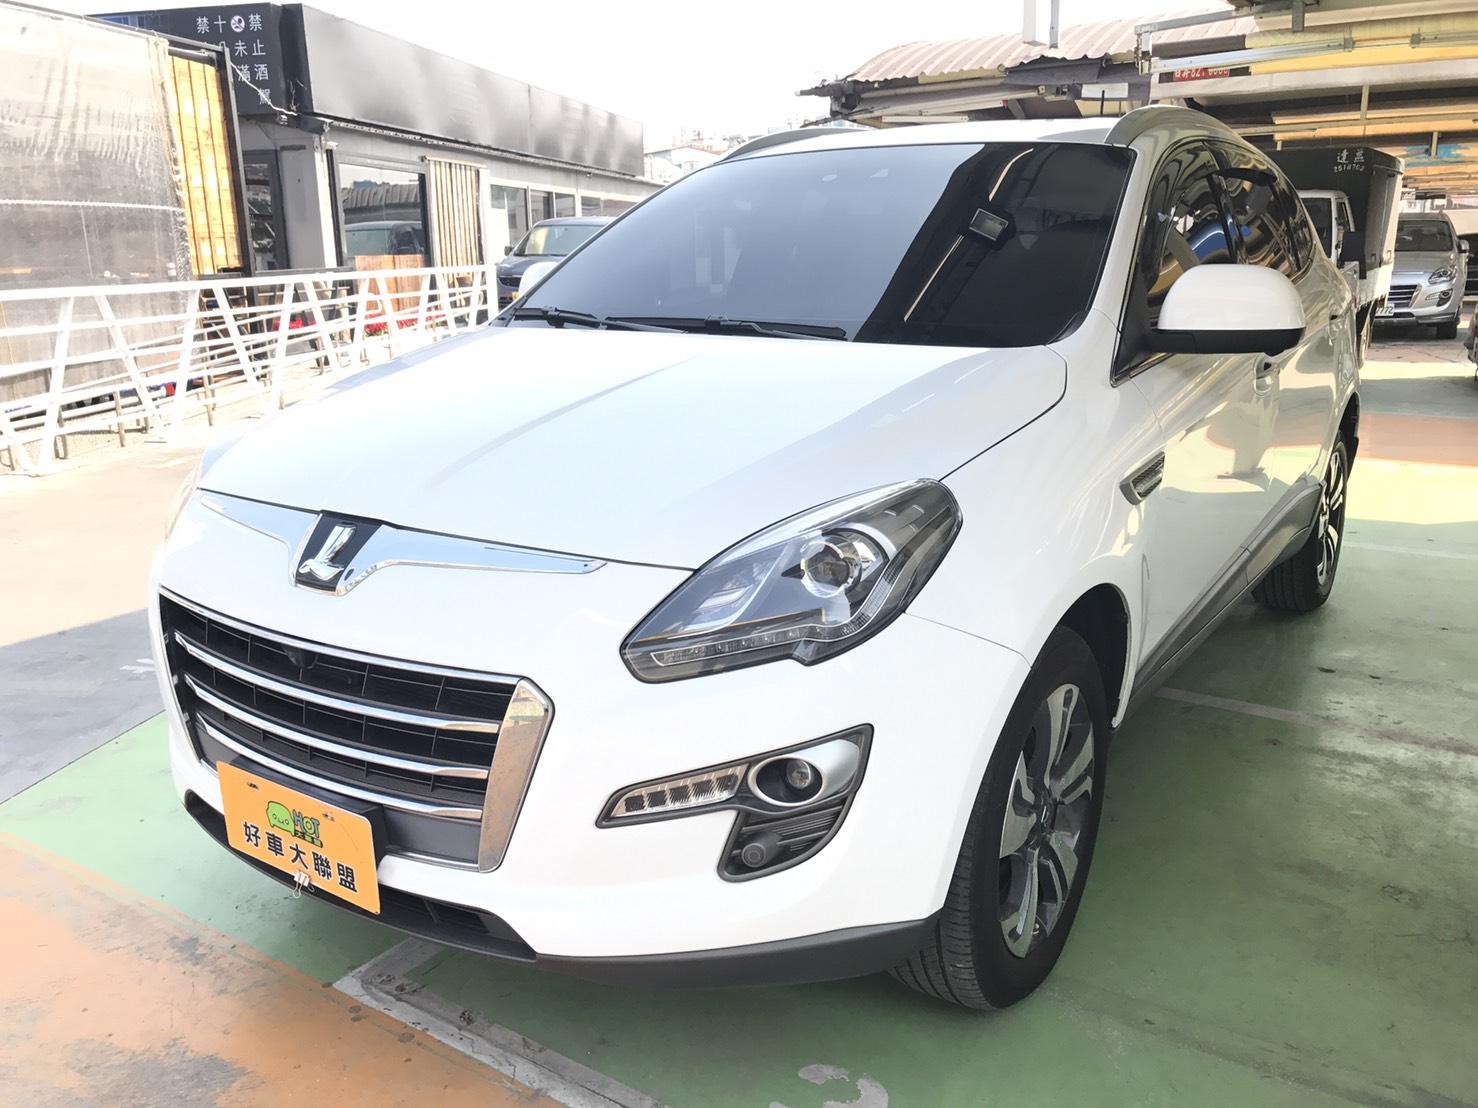 2016 Luxgen 納智捷 U7 turbo